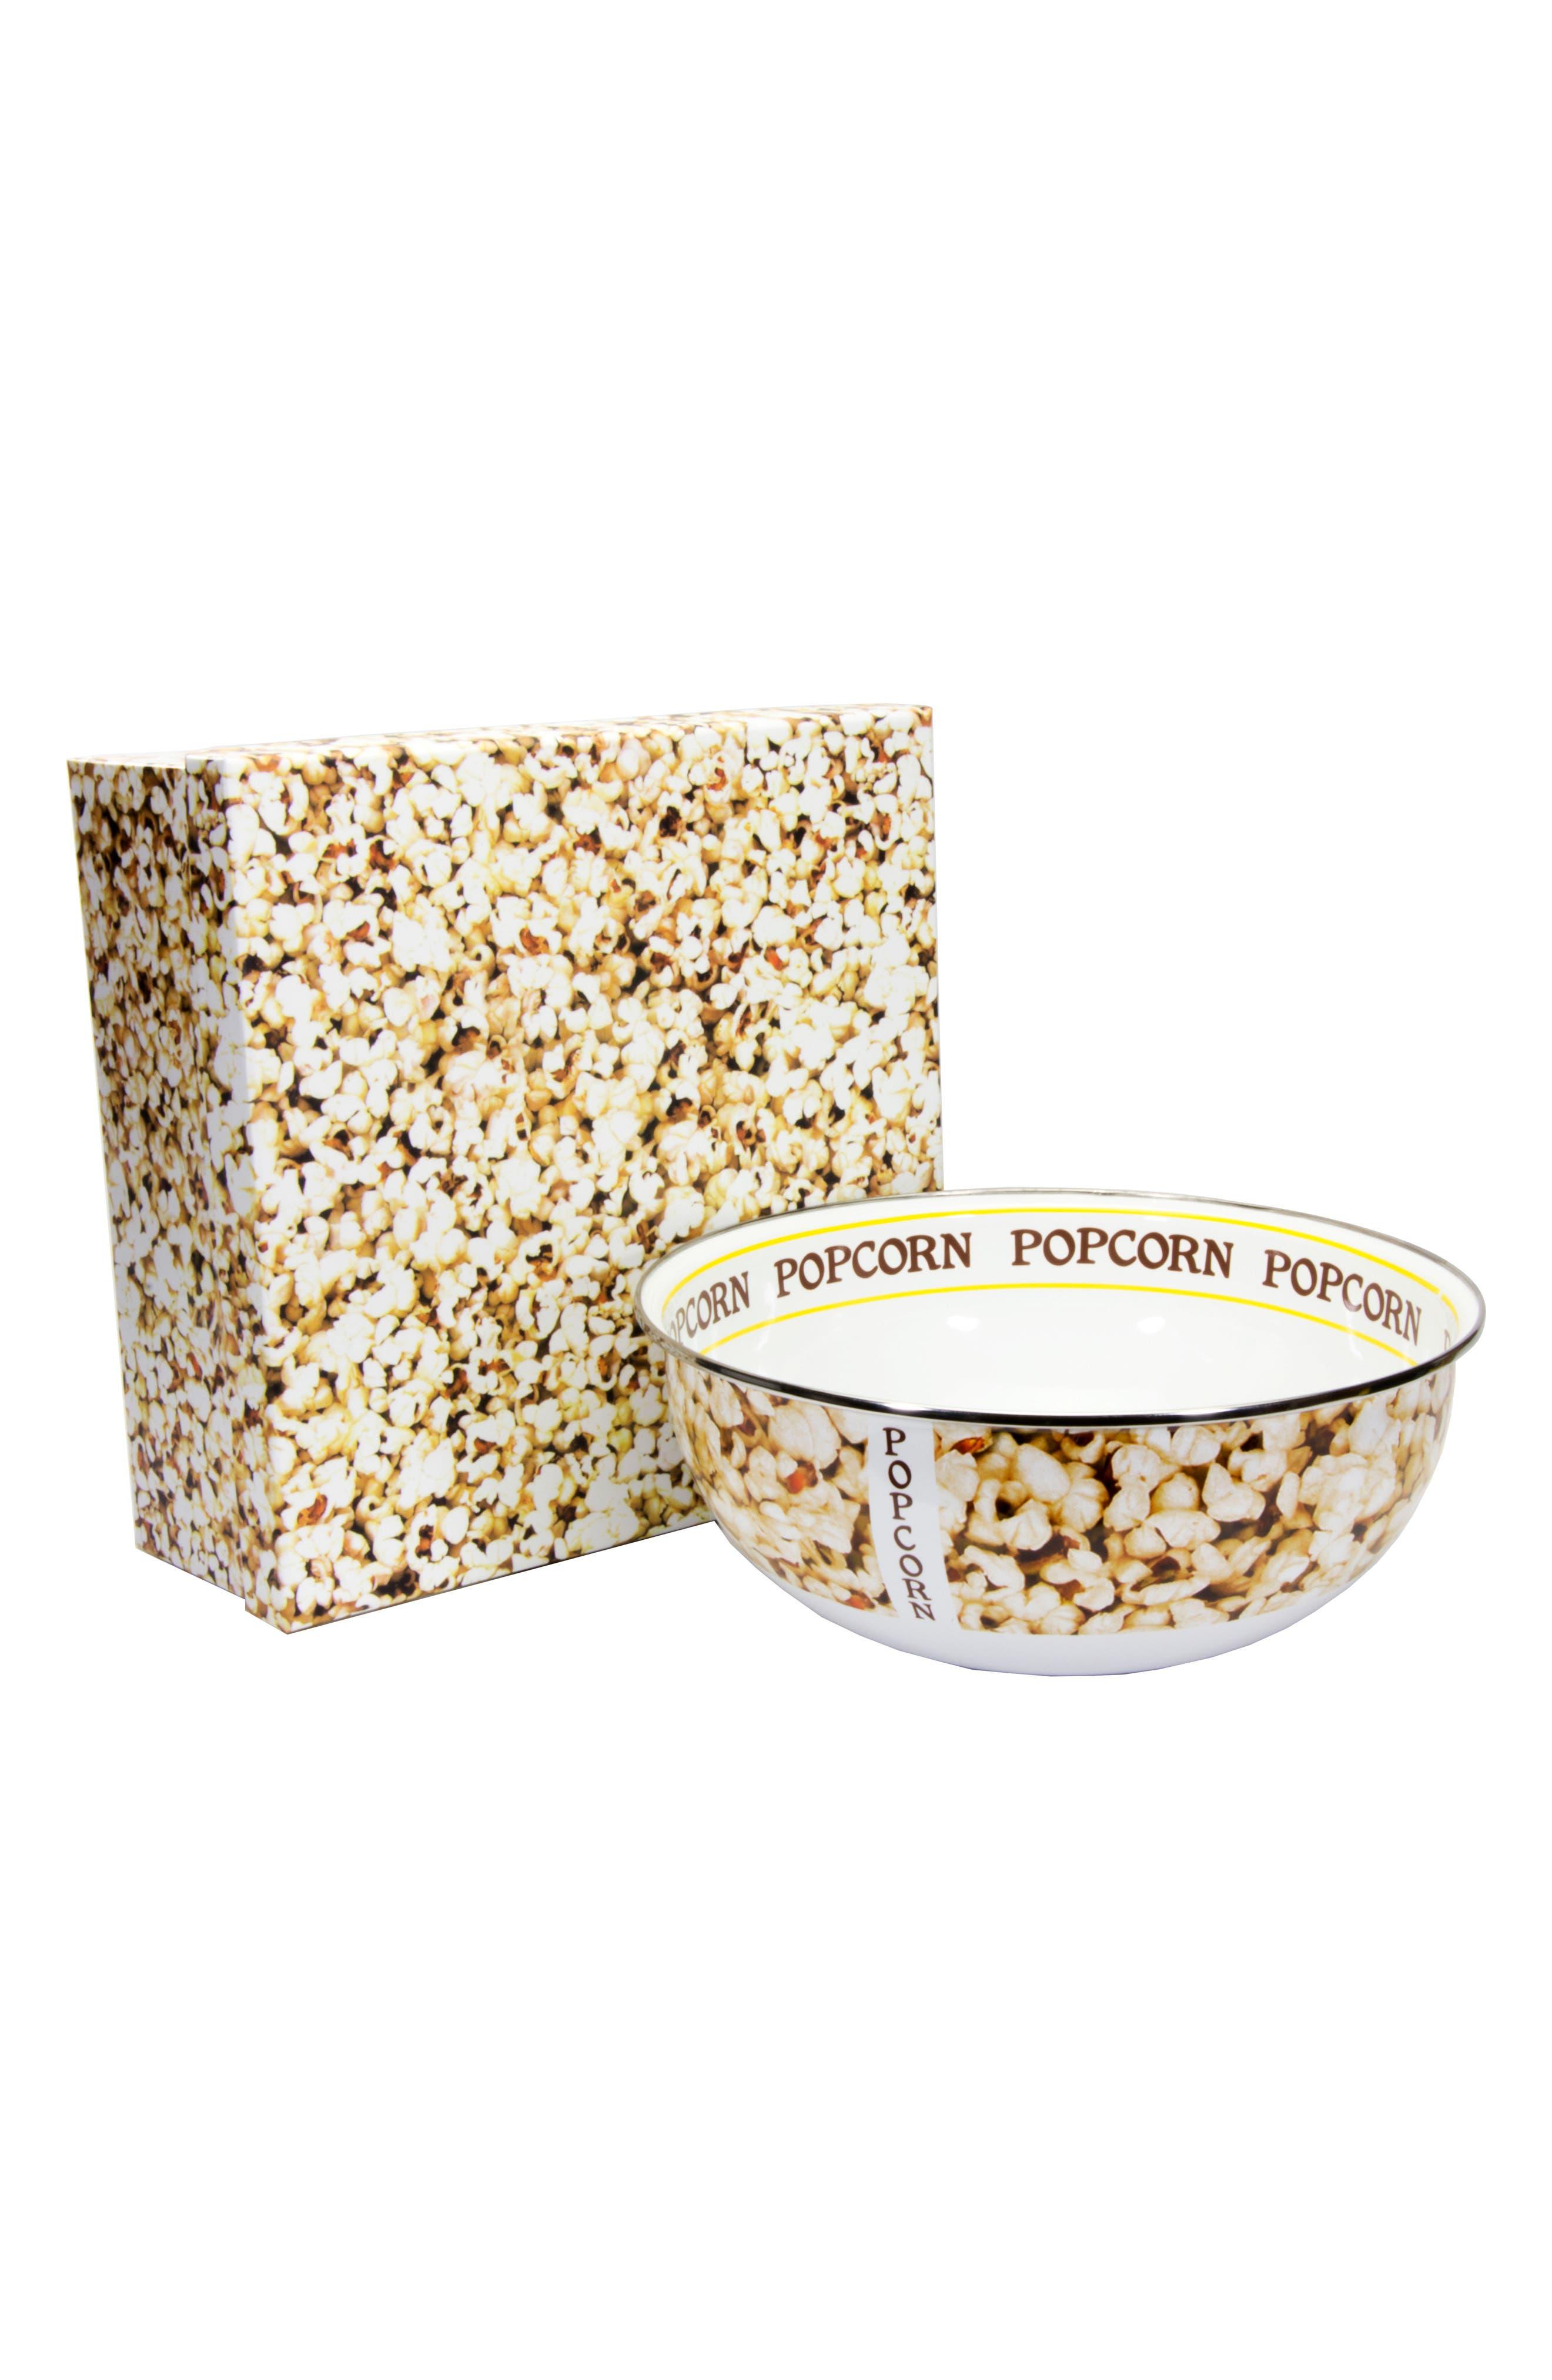 Popcorn Bowl,                         Main,                         color, Popcorn